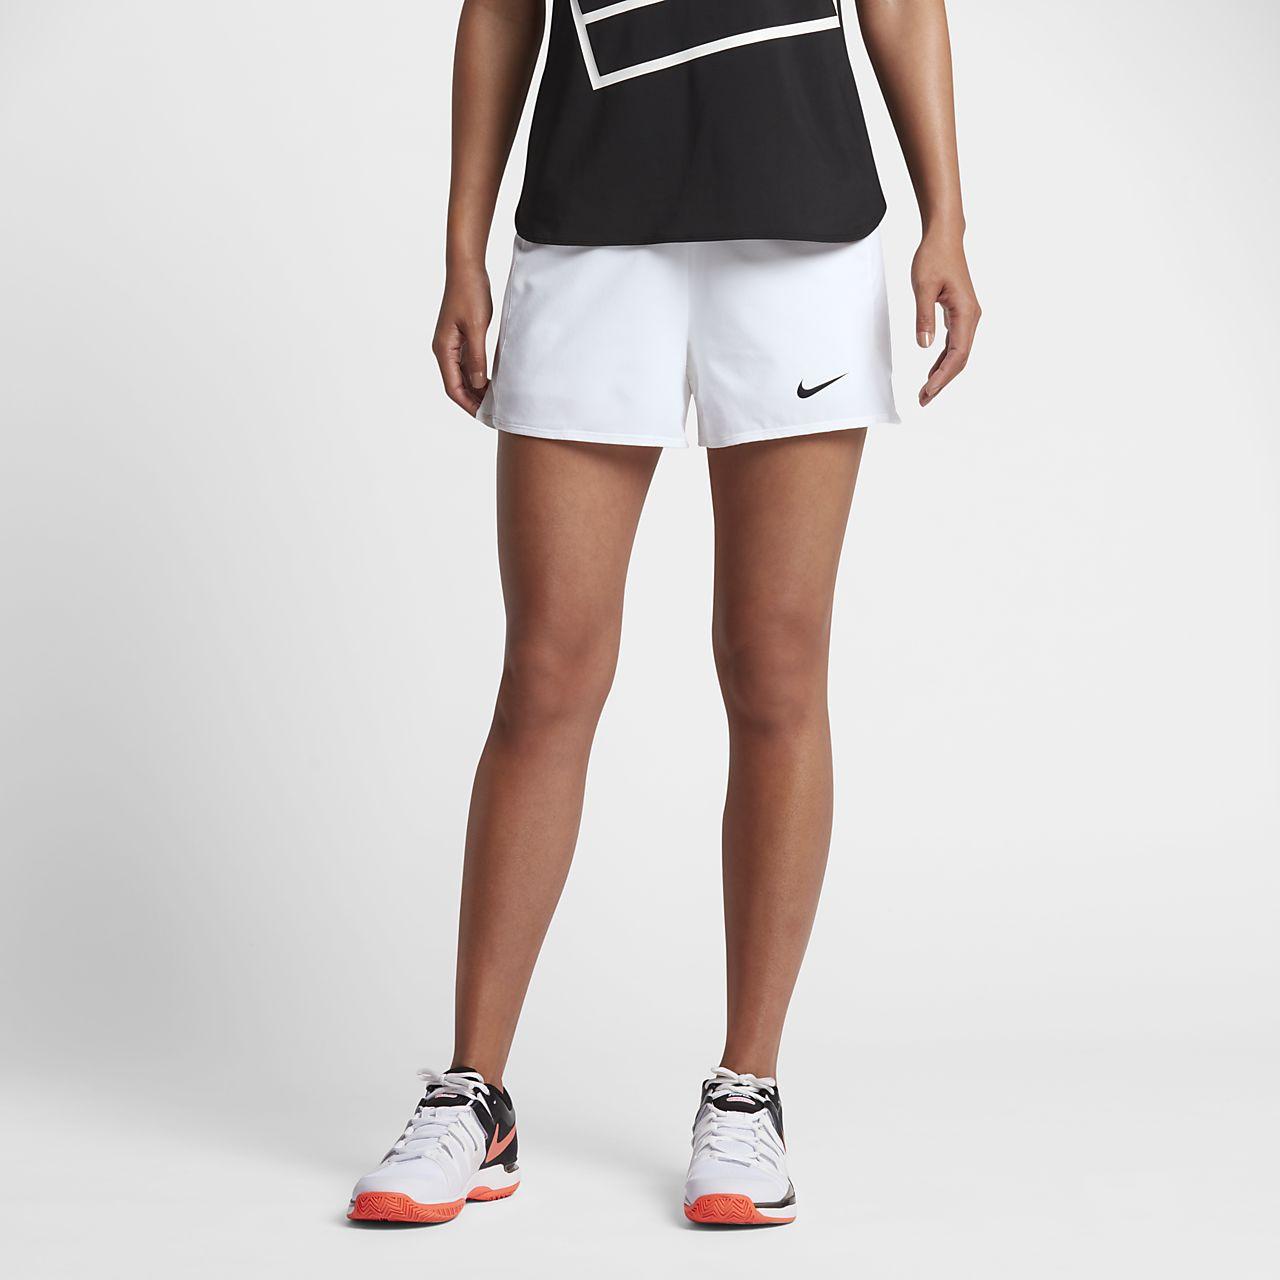 nike tennis shorts xs